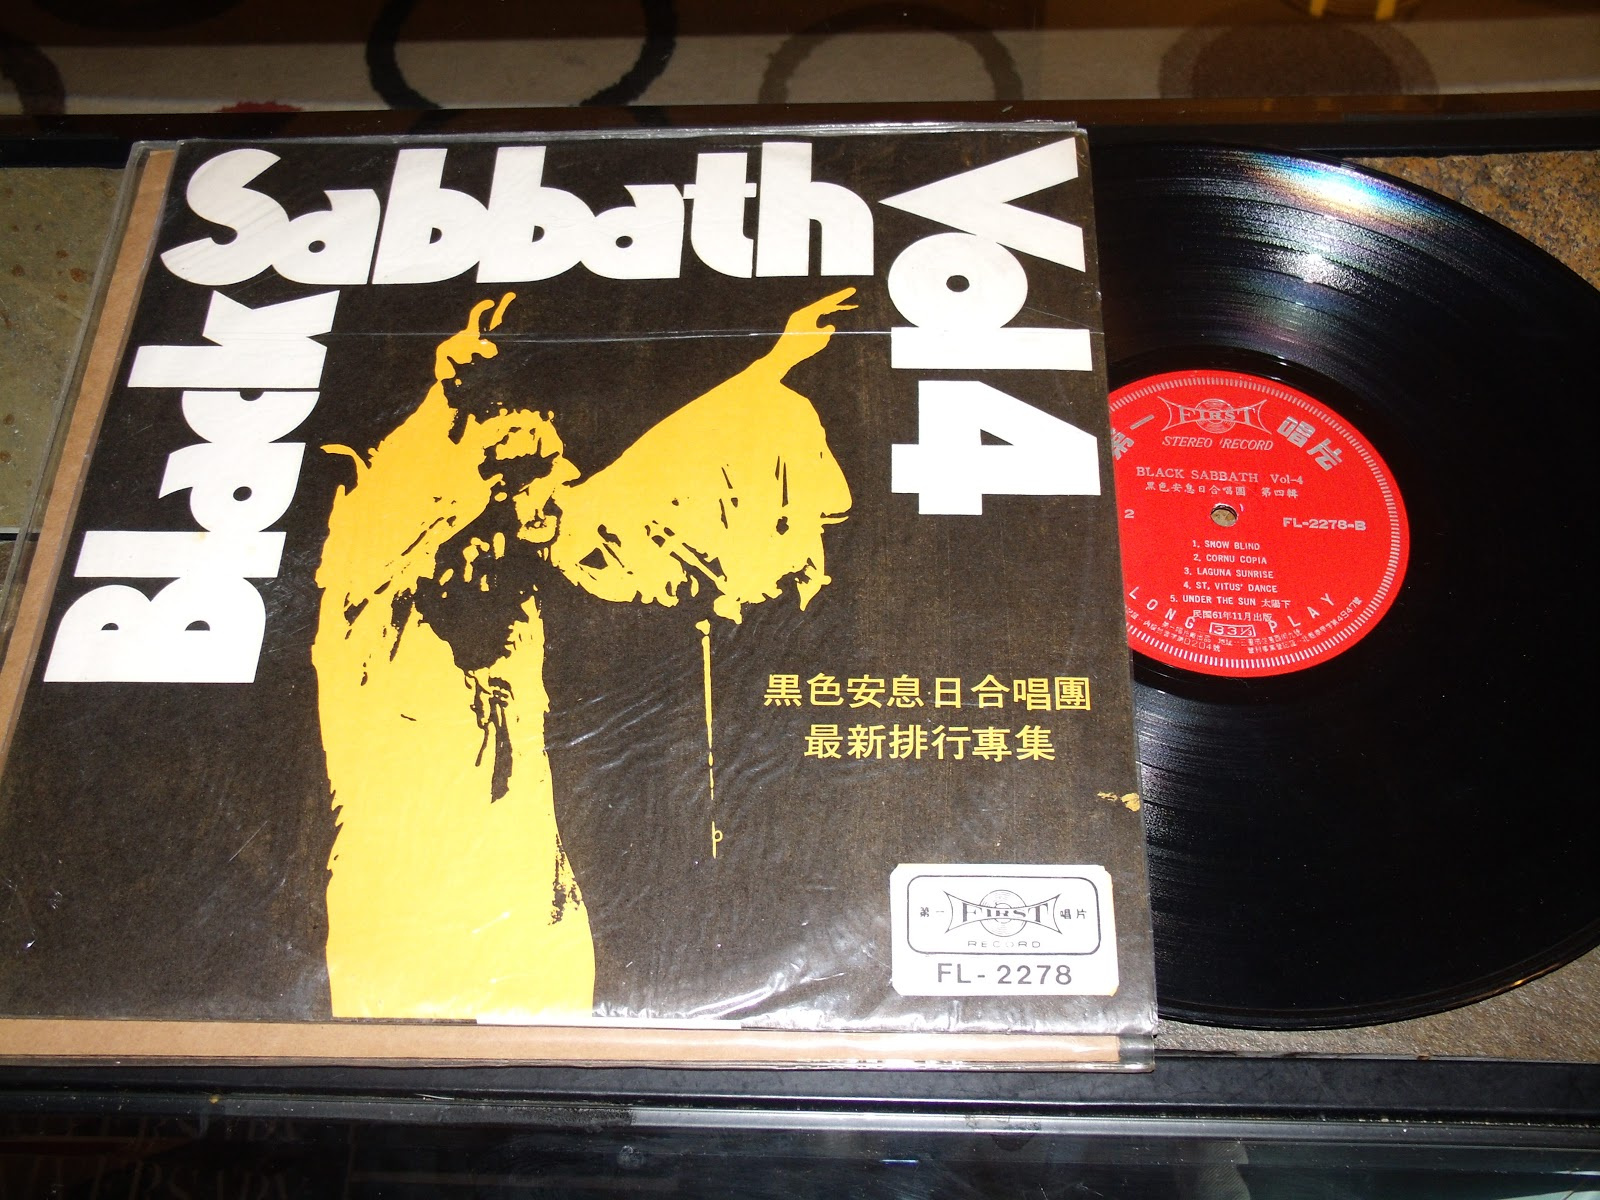 The Emerging Addiction Black Sabbath Vol 4 Odd Taiwanese